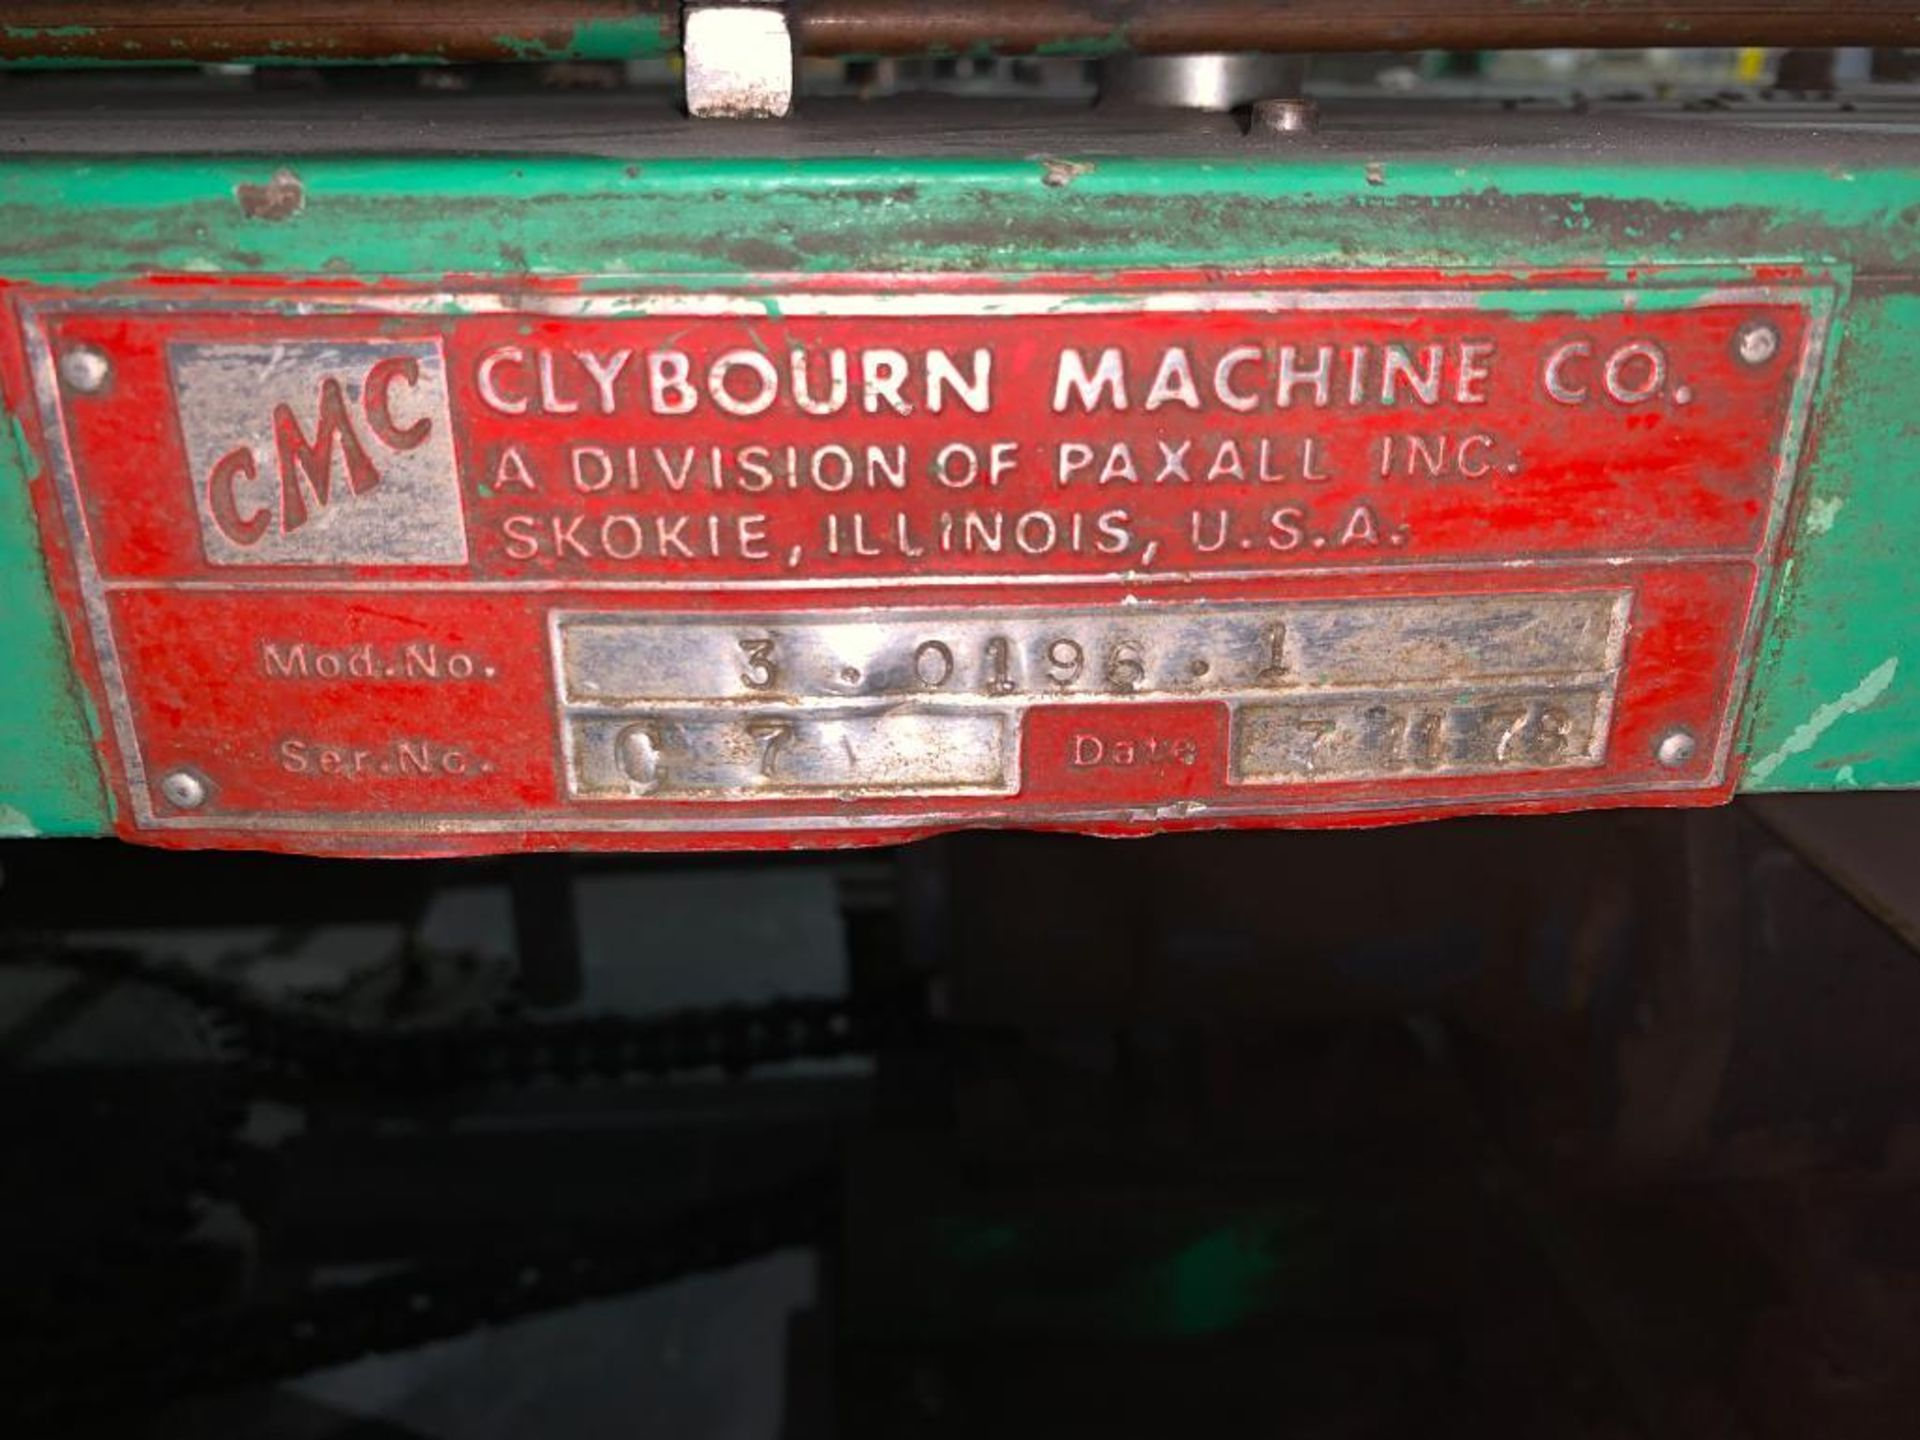 1978 Clybourn carton erecting filling closing machine - Image 12 of 68